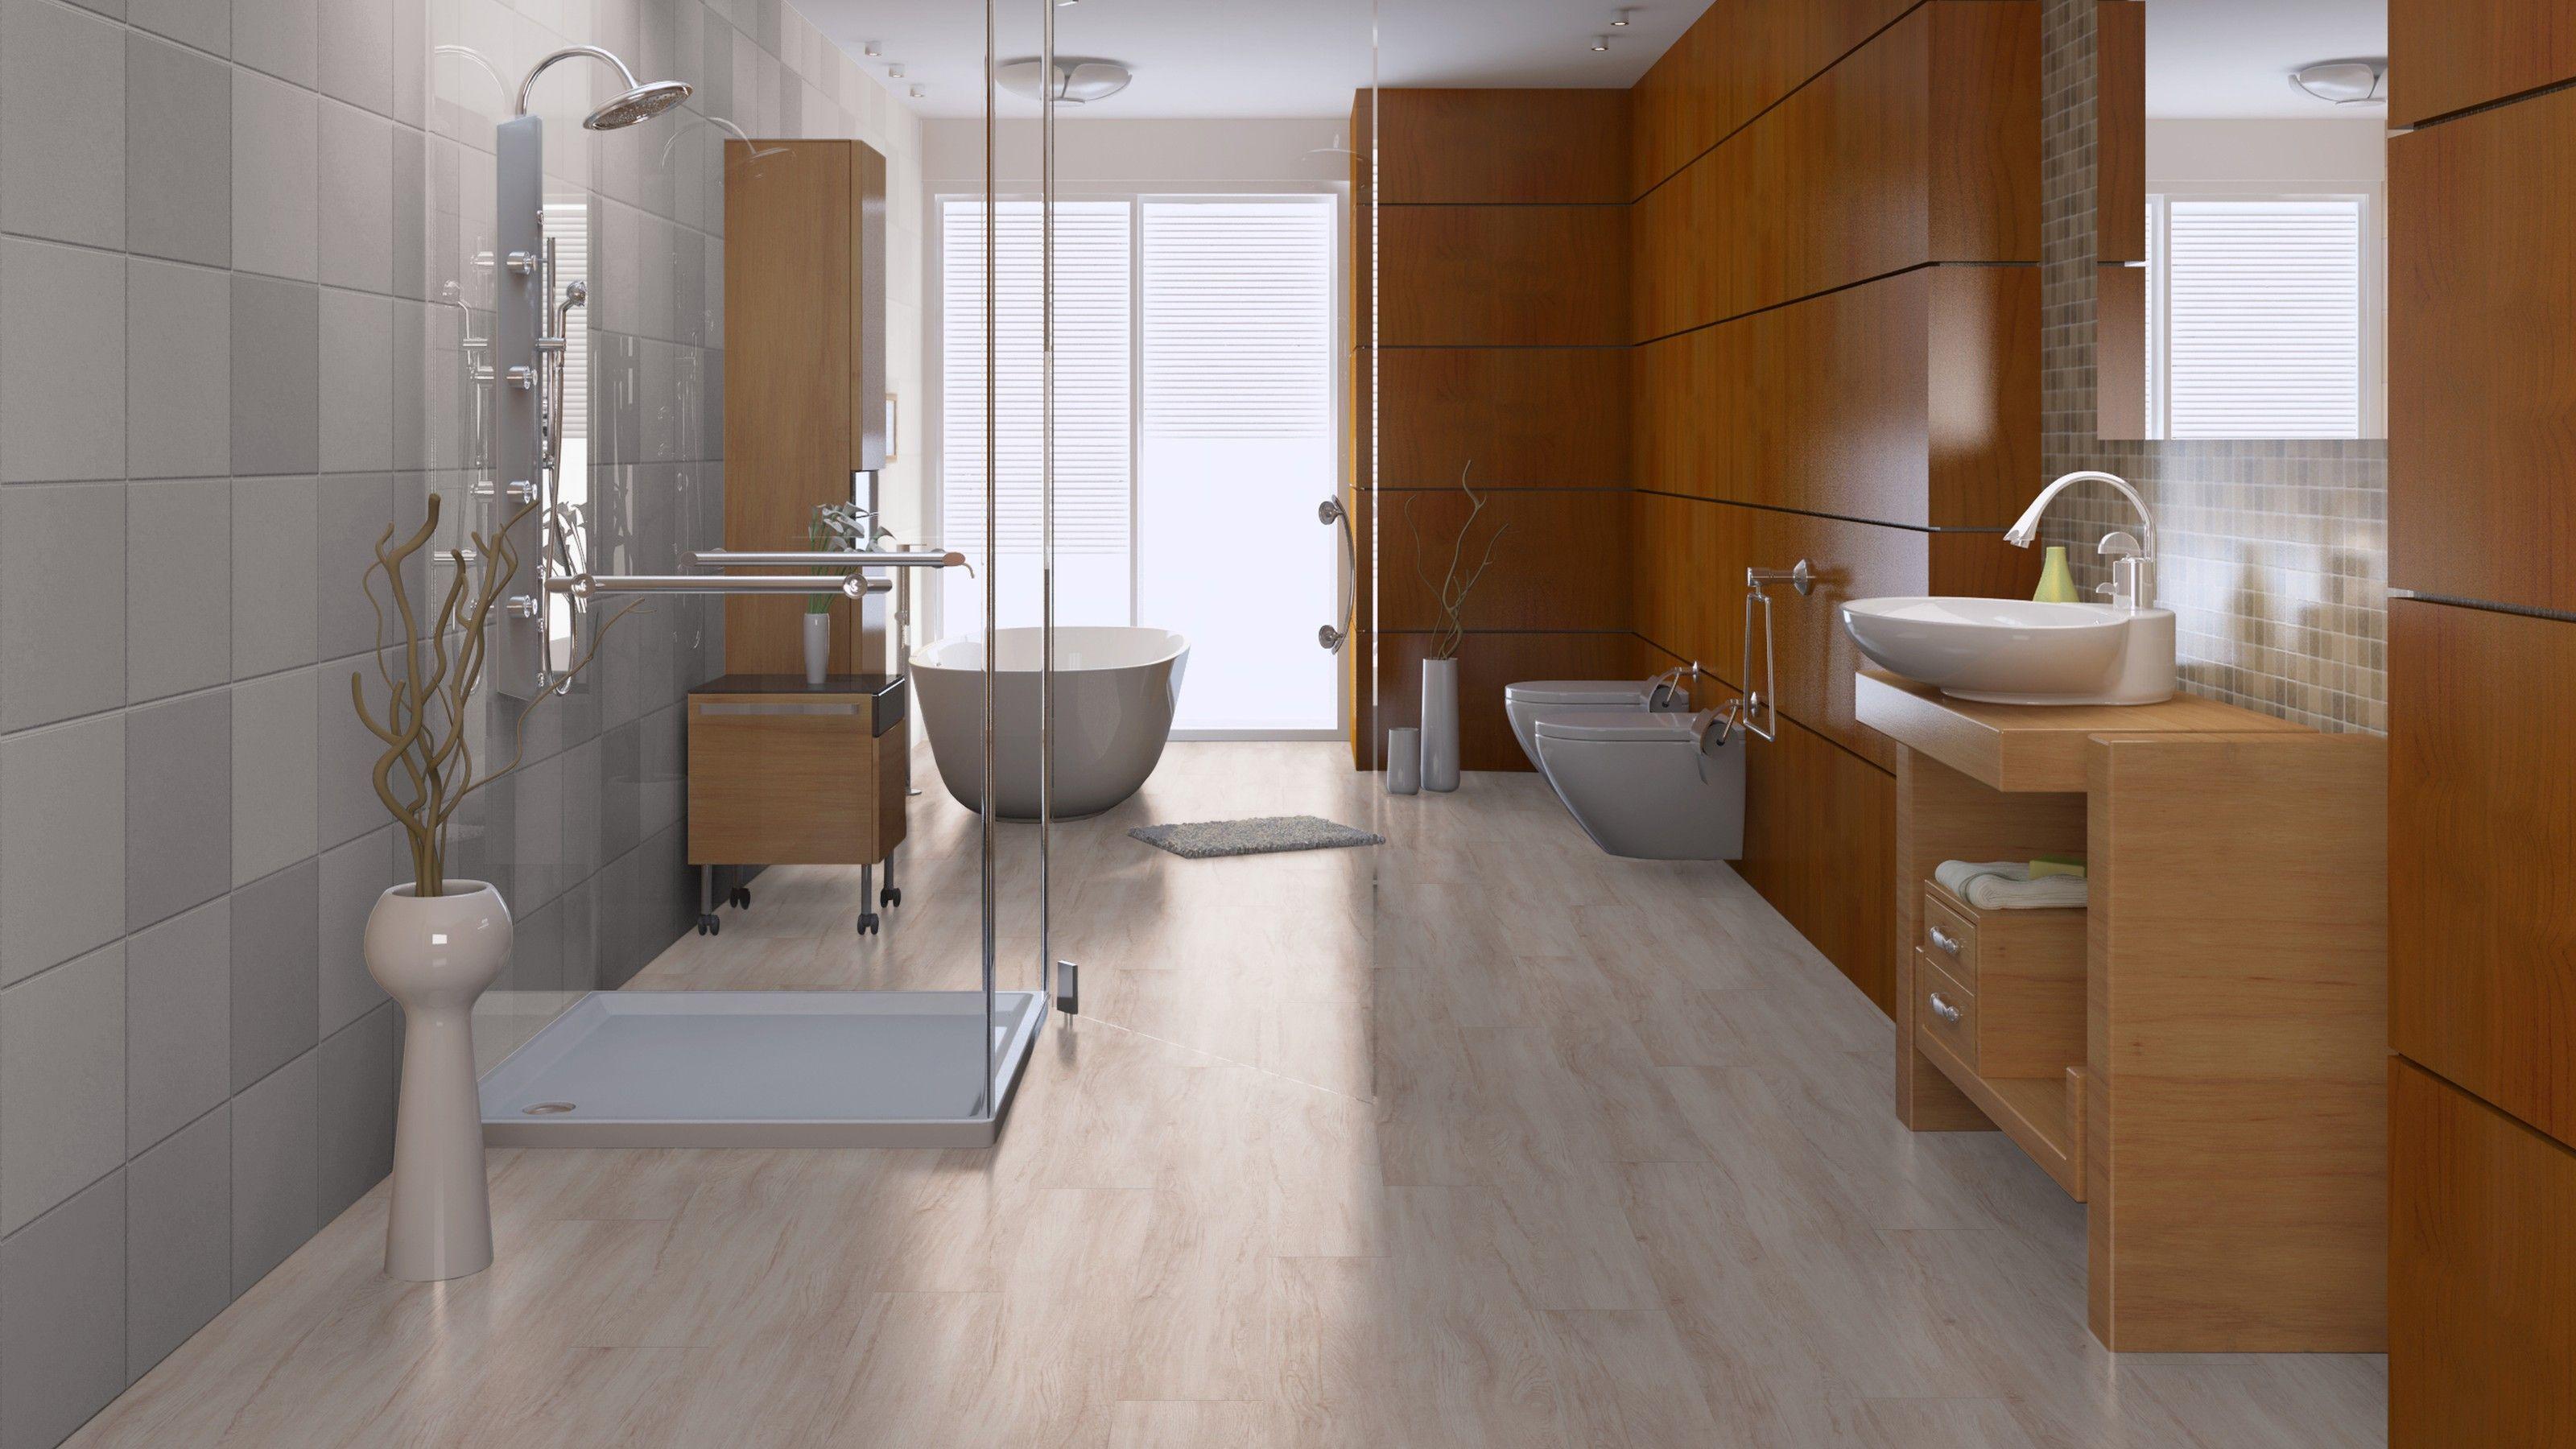 badkamer met mflor grand chesham oak wonder op de vloer